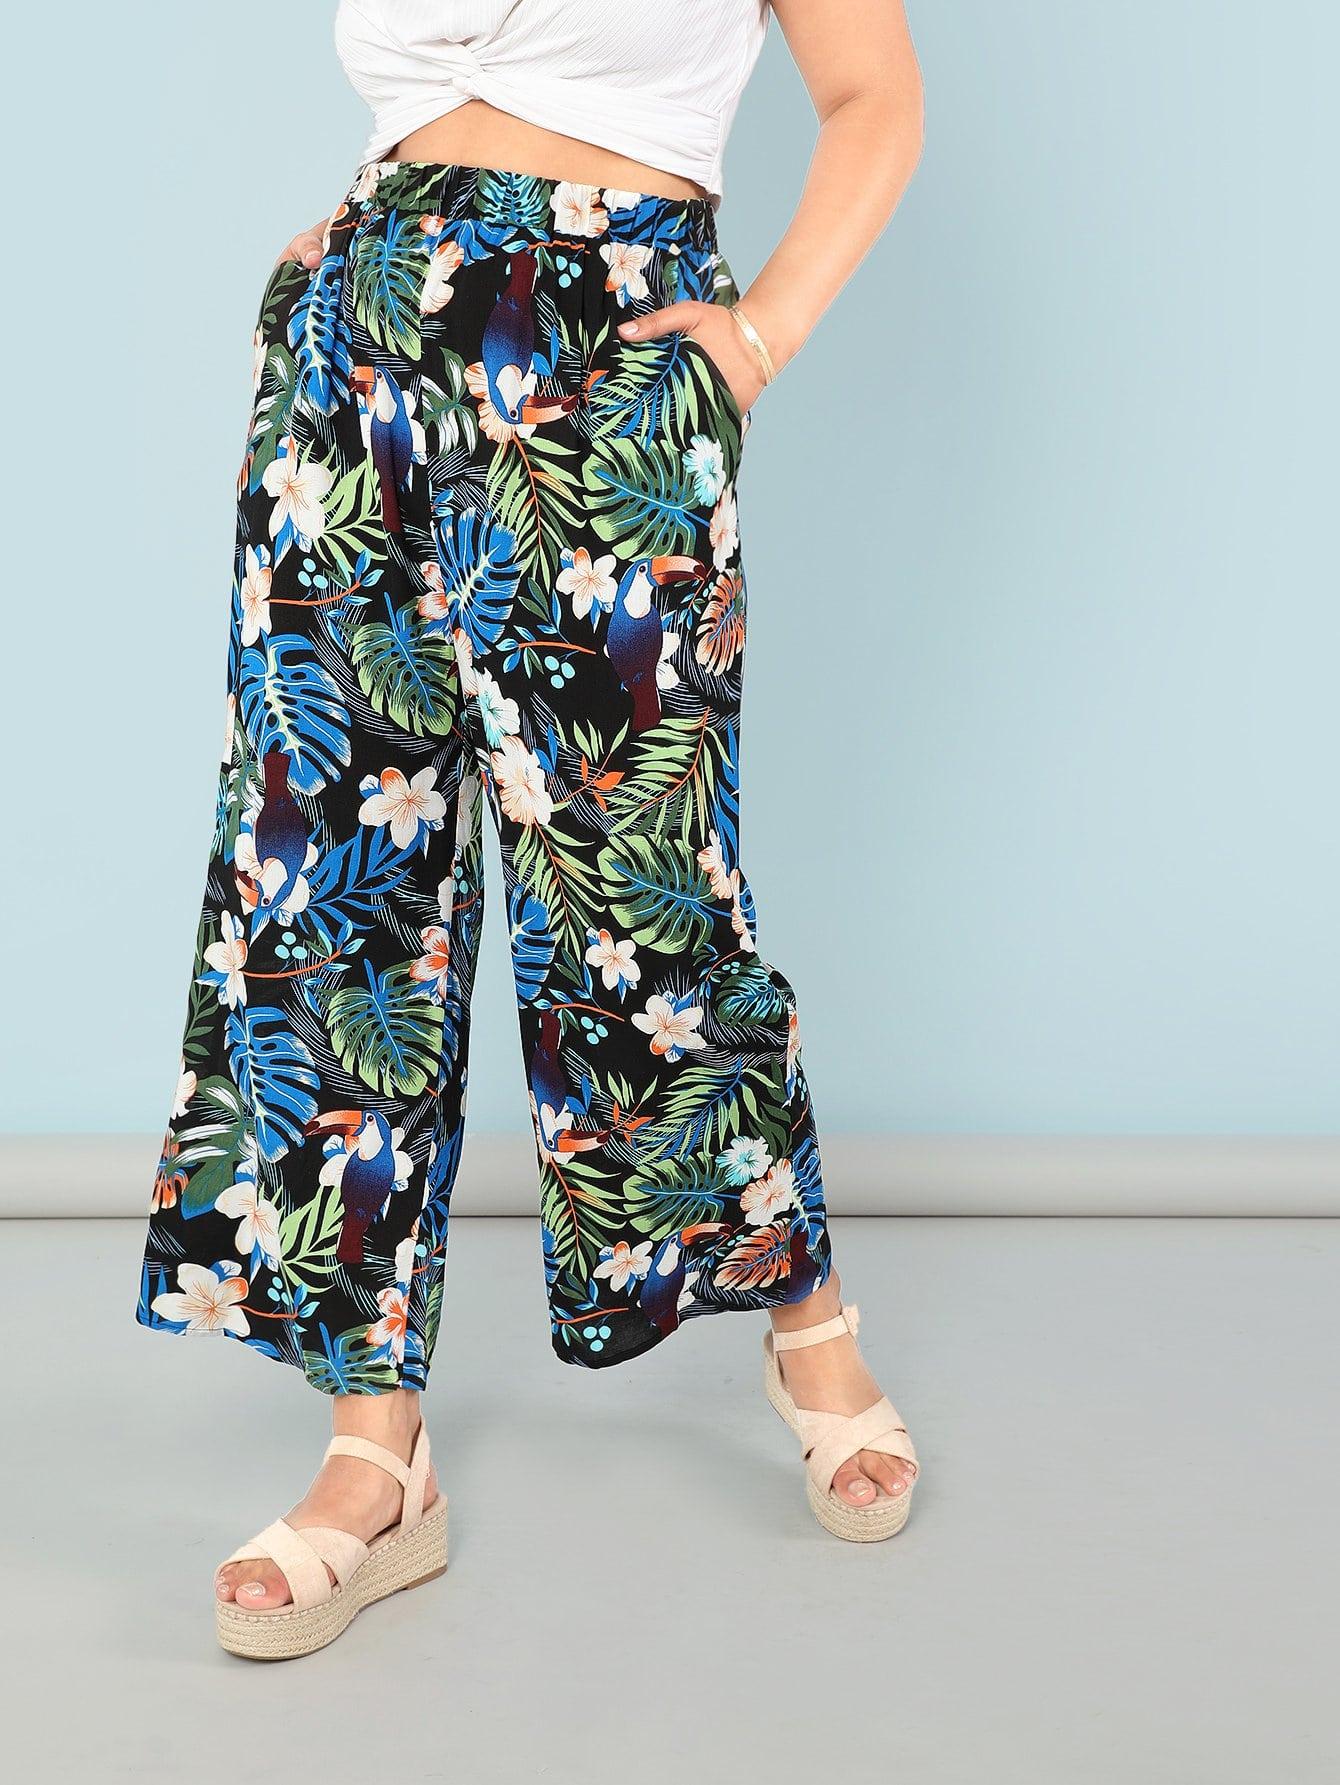 Jungle Leaf and Floral Pants flamingo and jungle leaf print top and pants pajama set